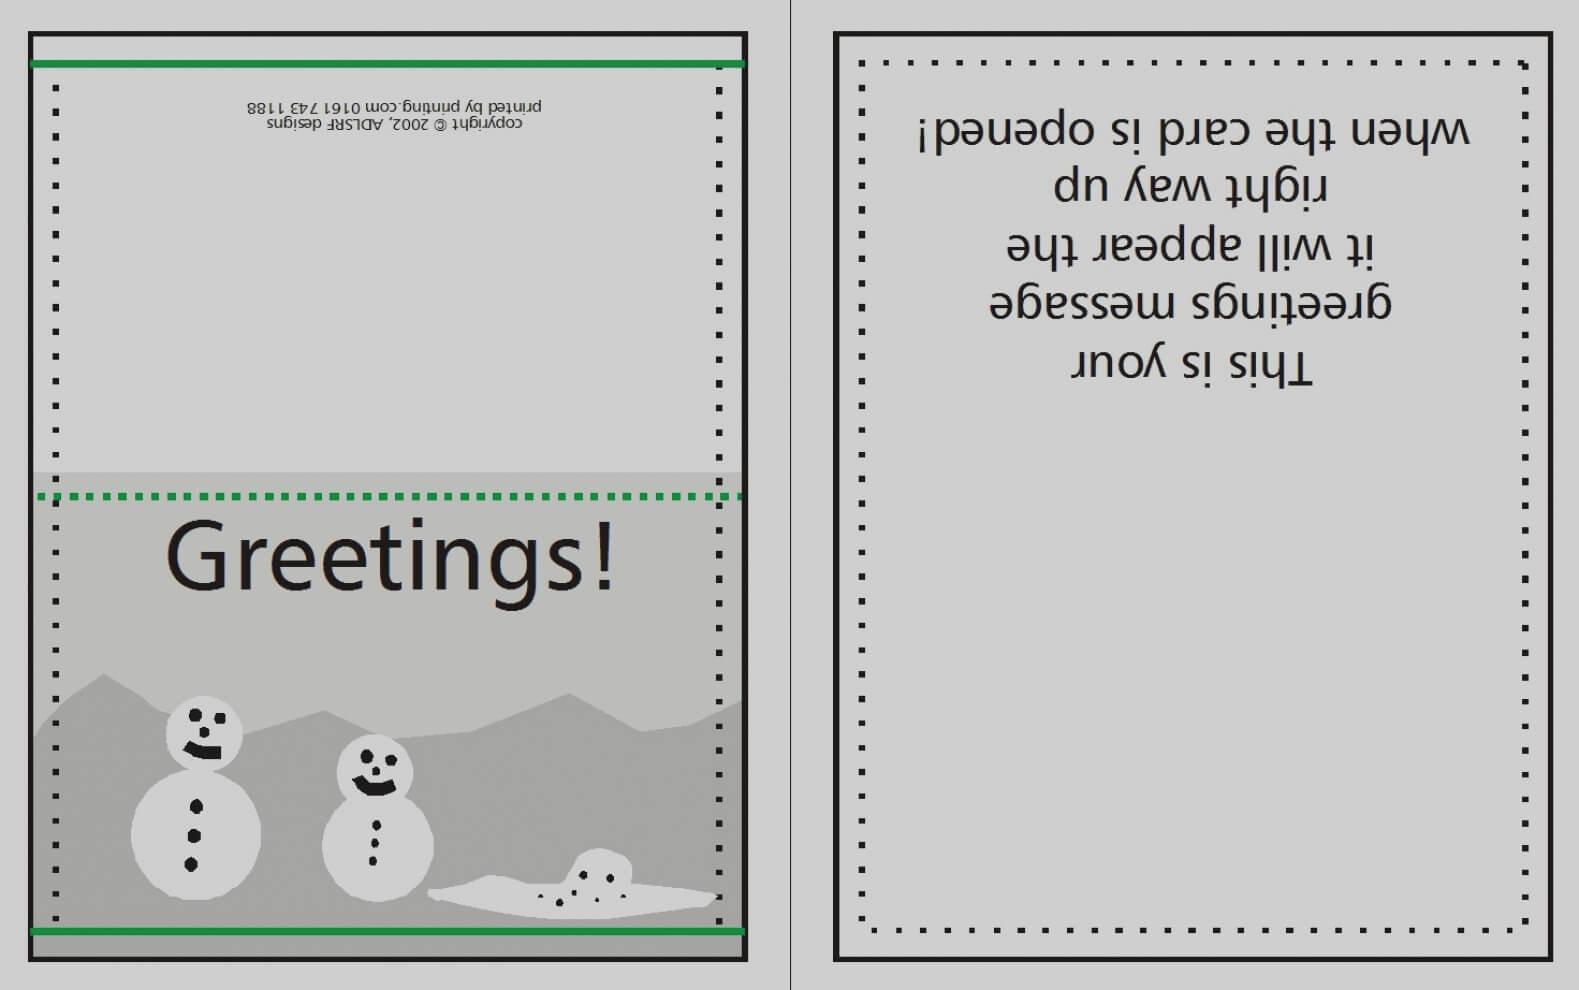 027 Card Template Birthday Invitation Quarter Fold In Ideas Within Quarter Fold Card Template